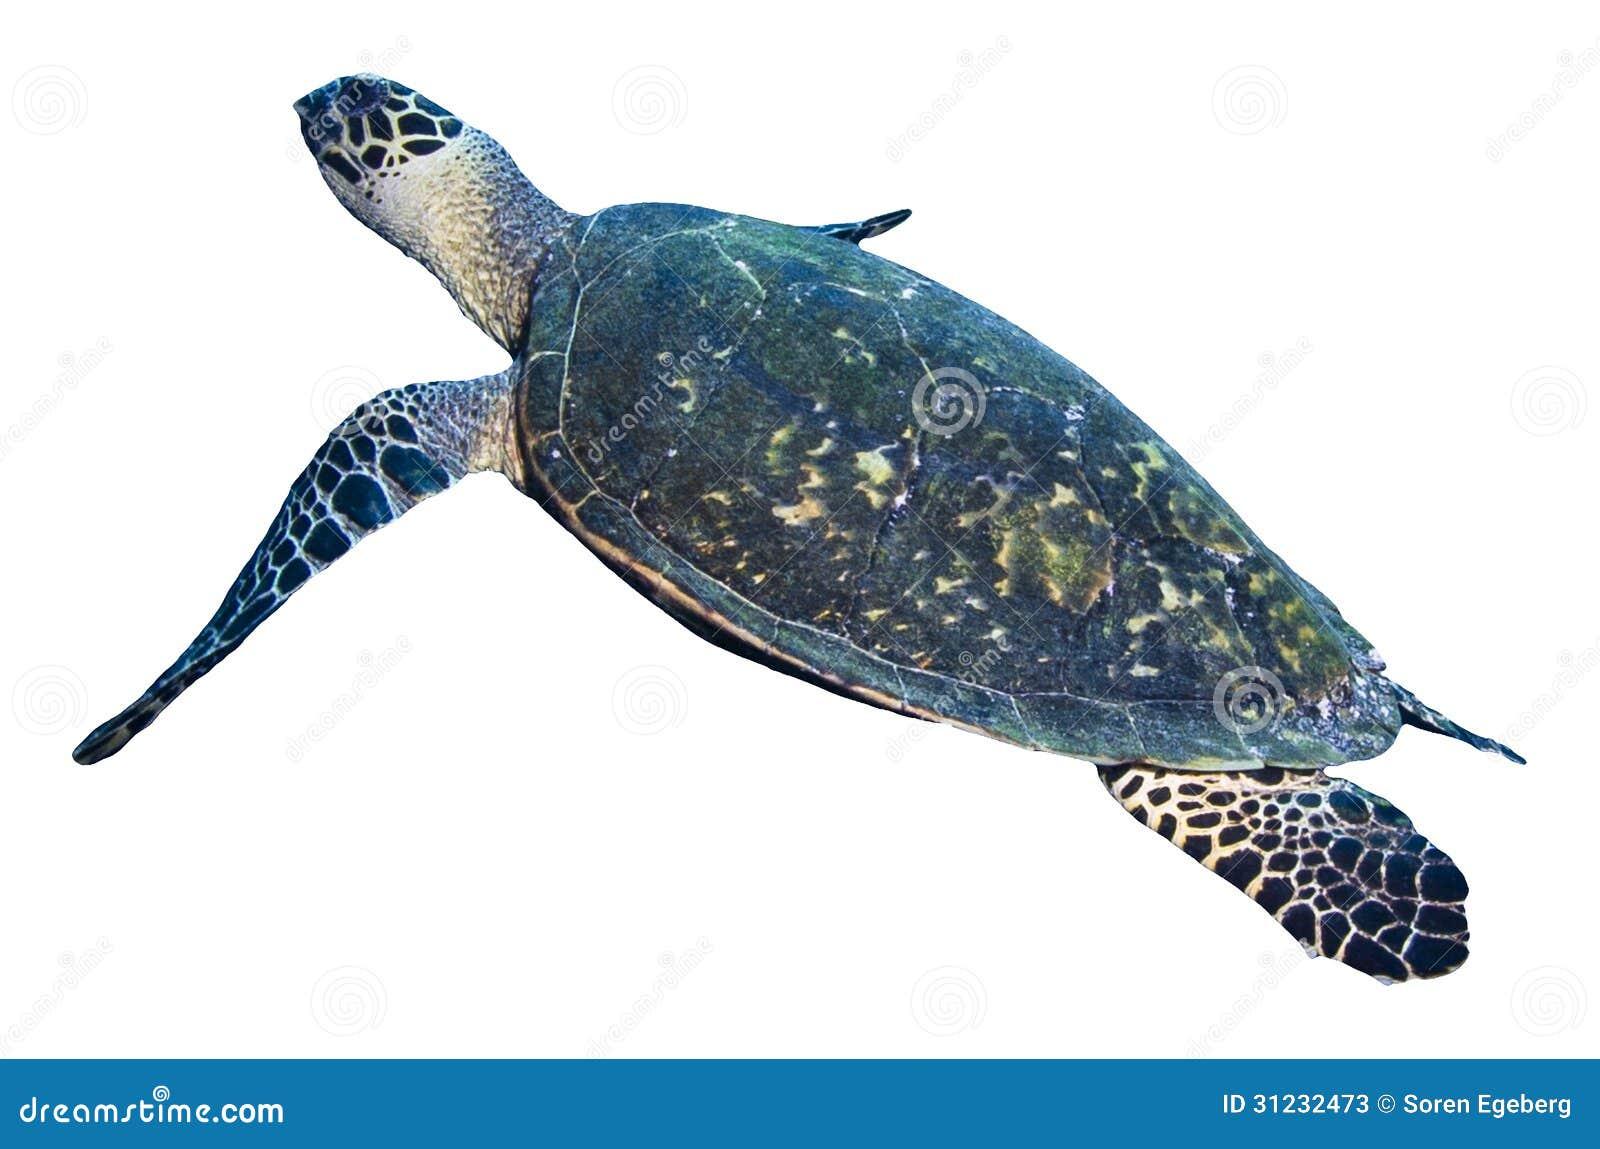 turtle white background - photo #22